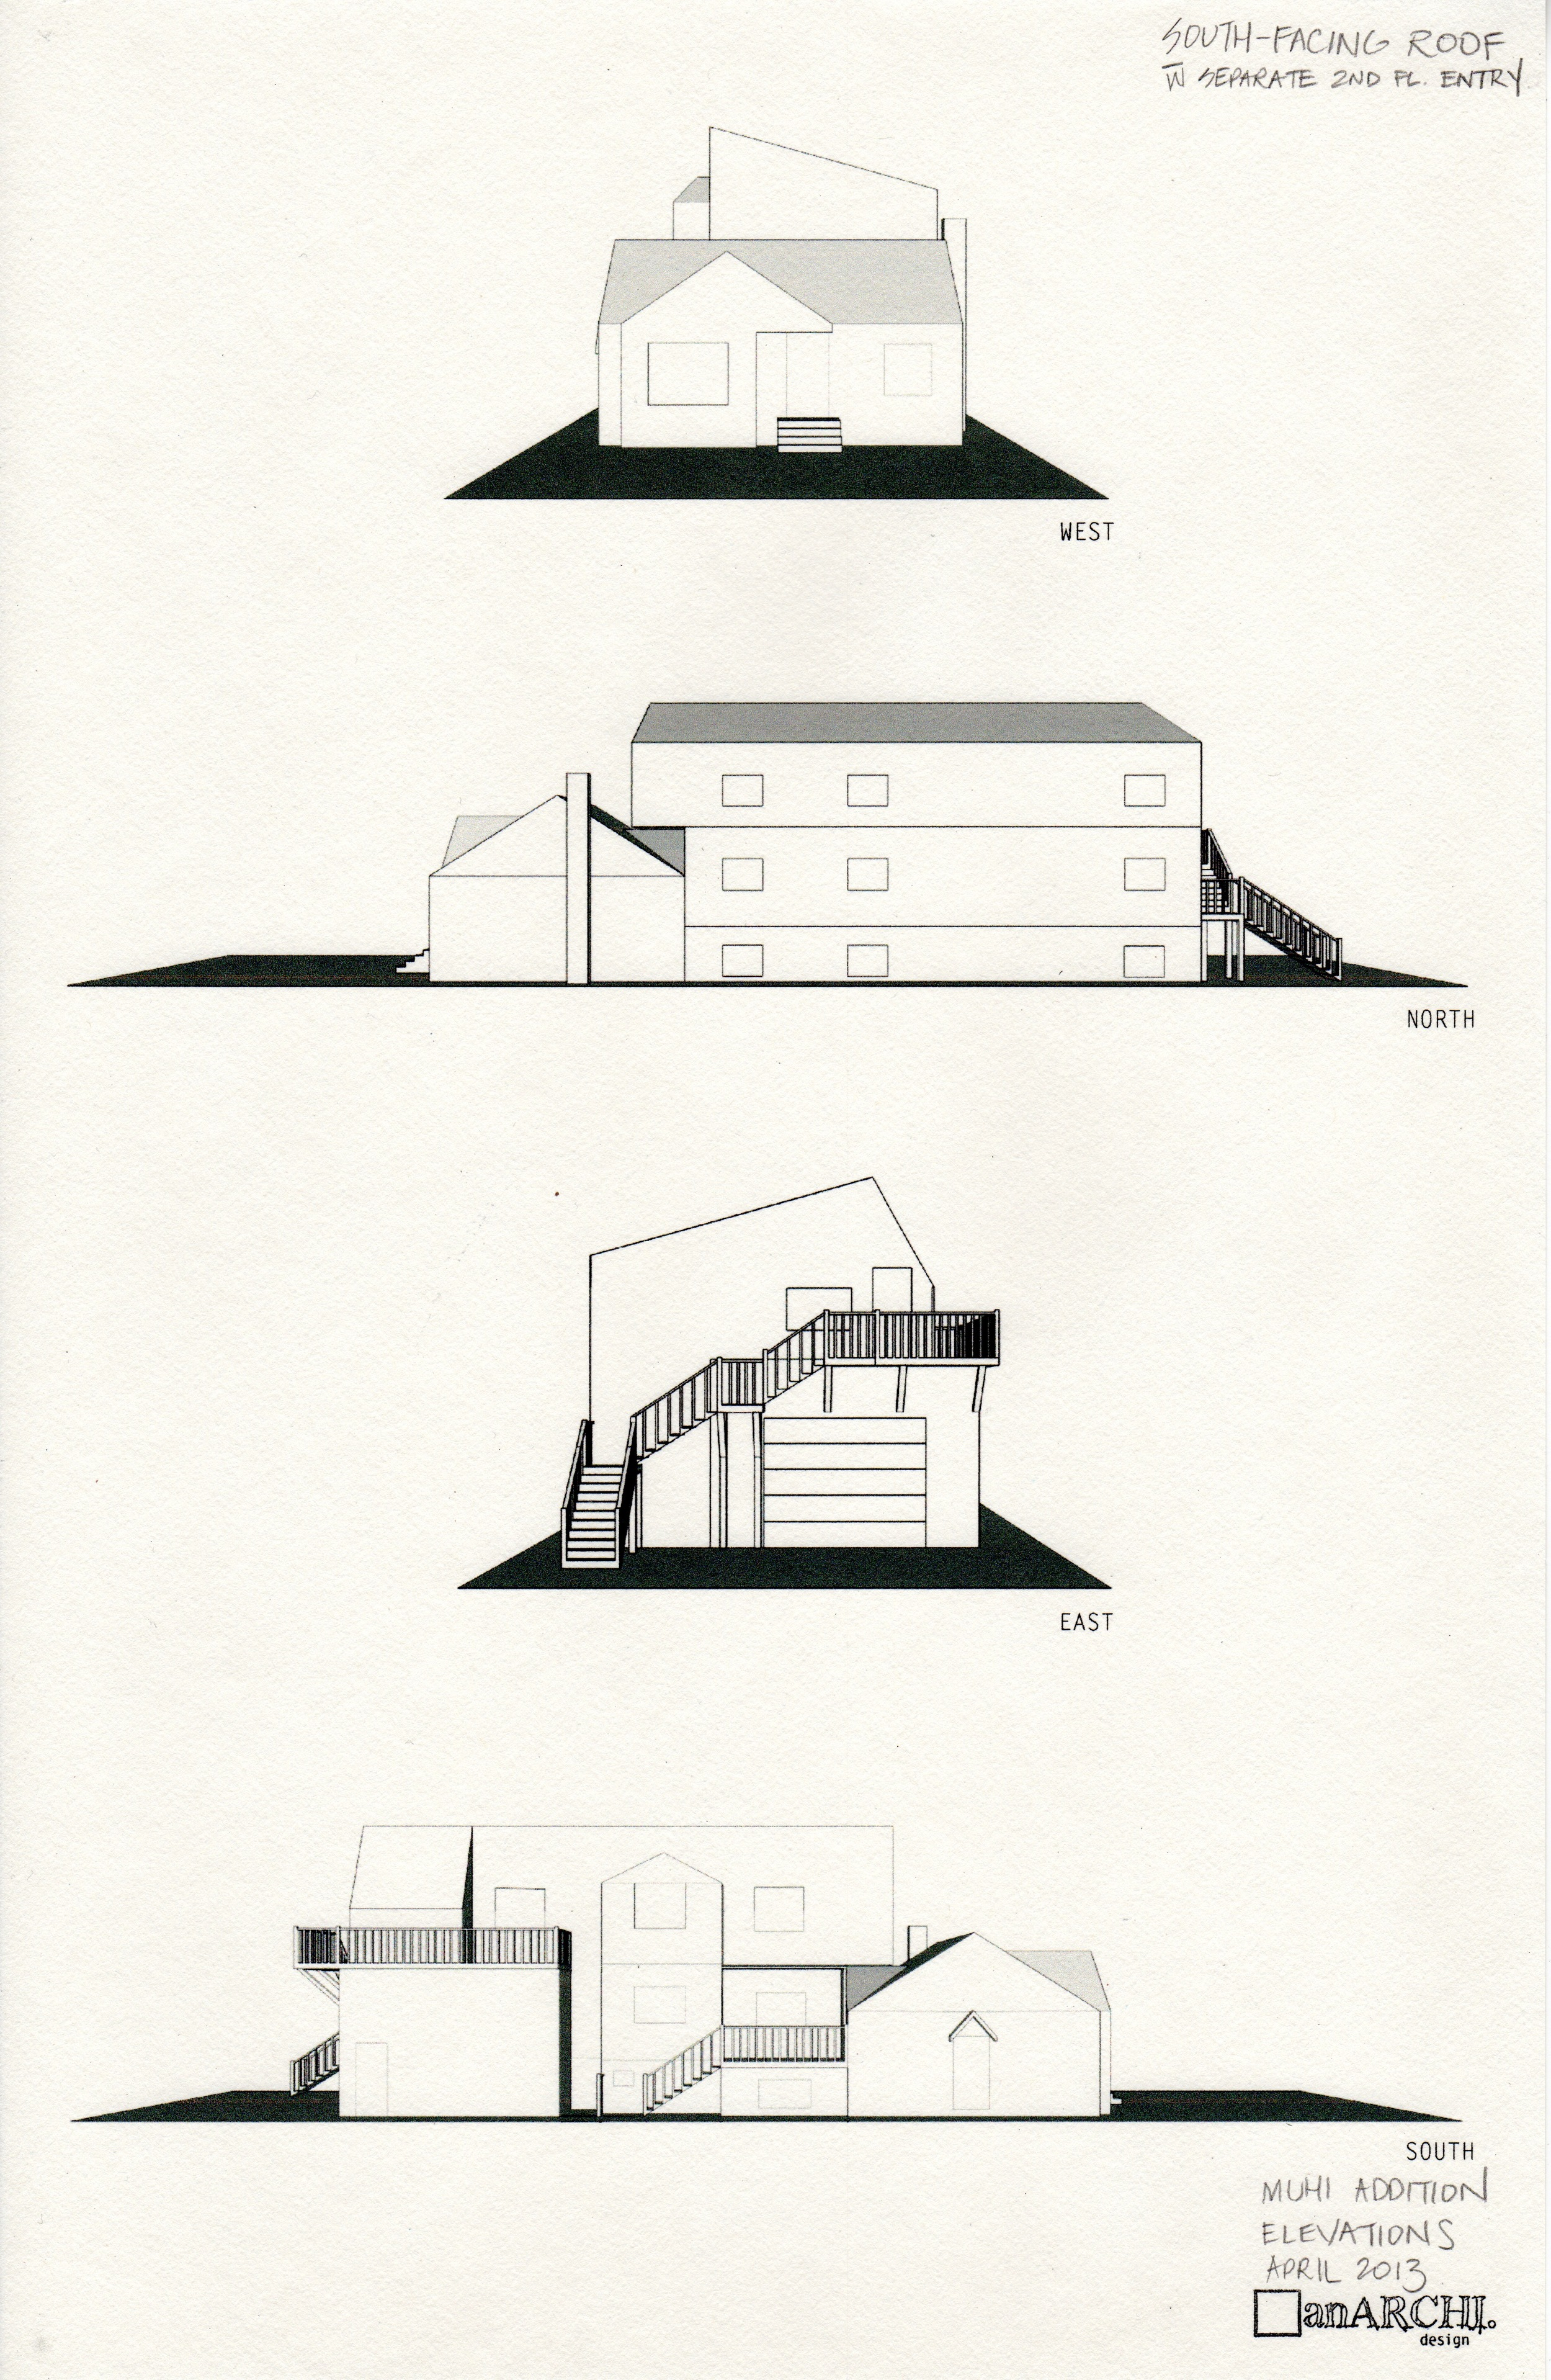 Design 2 - elevational views